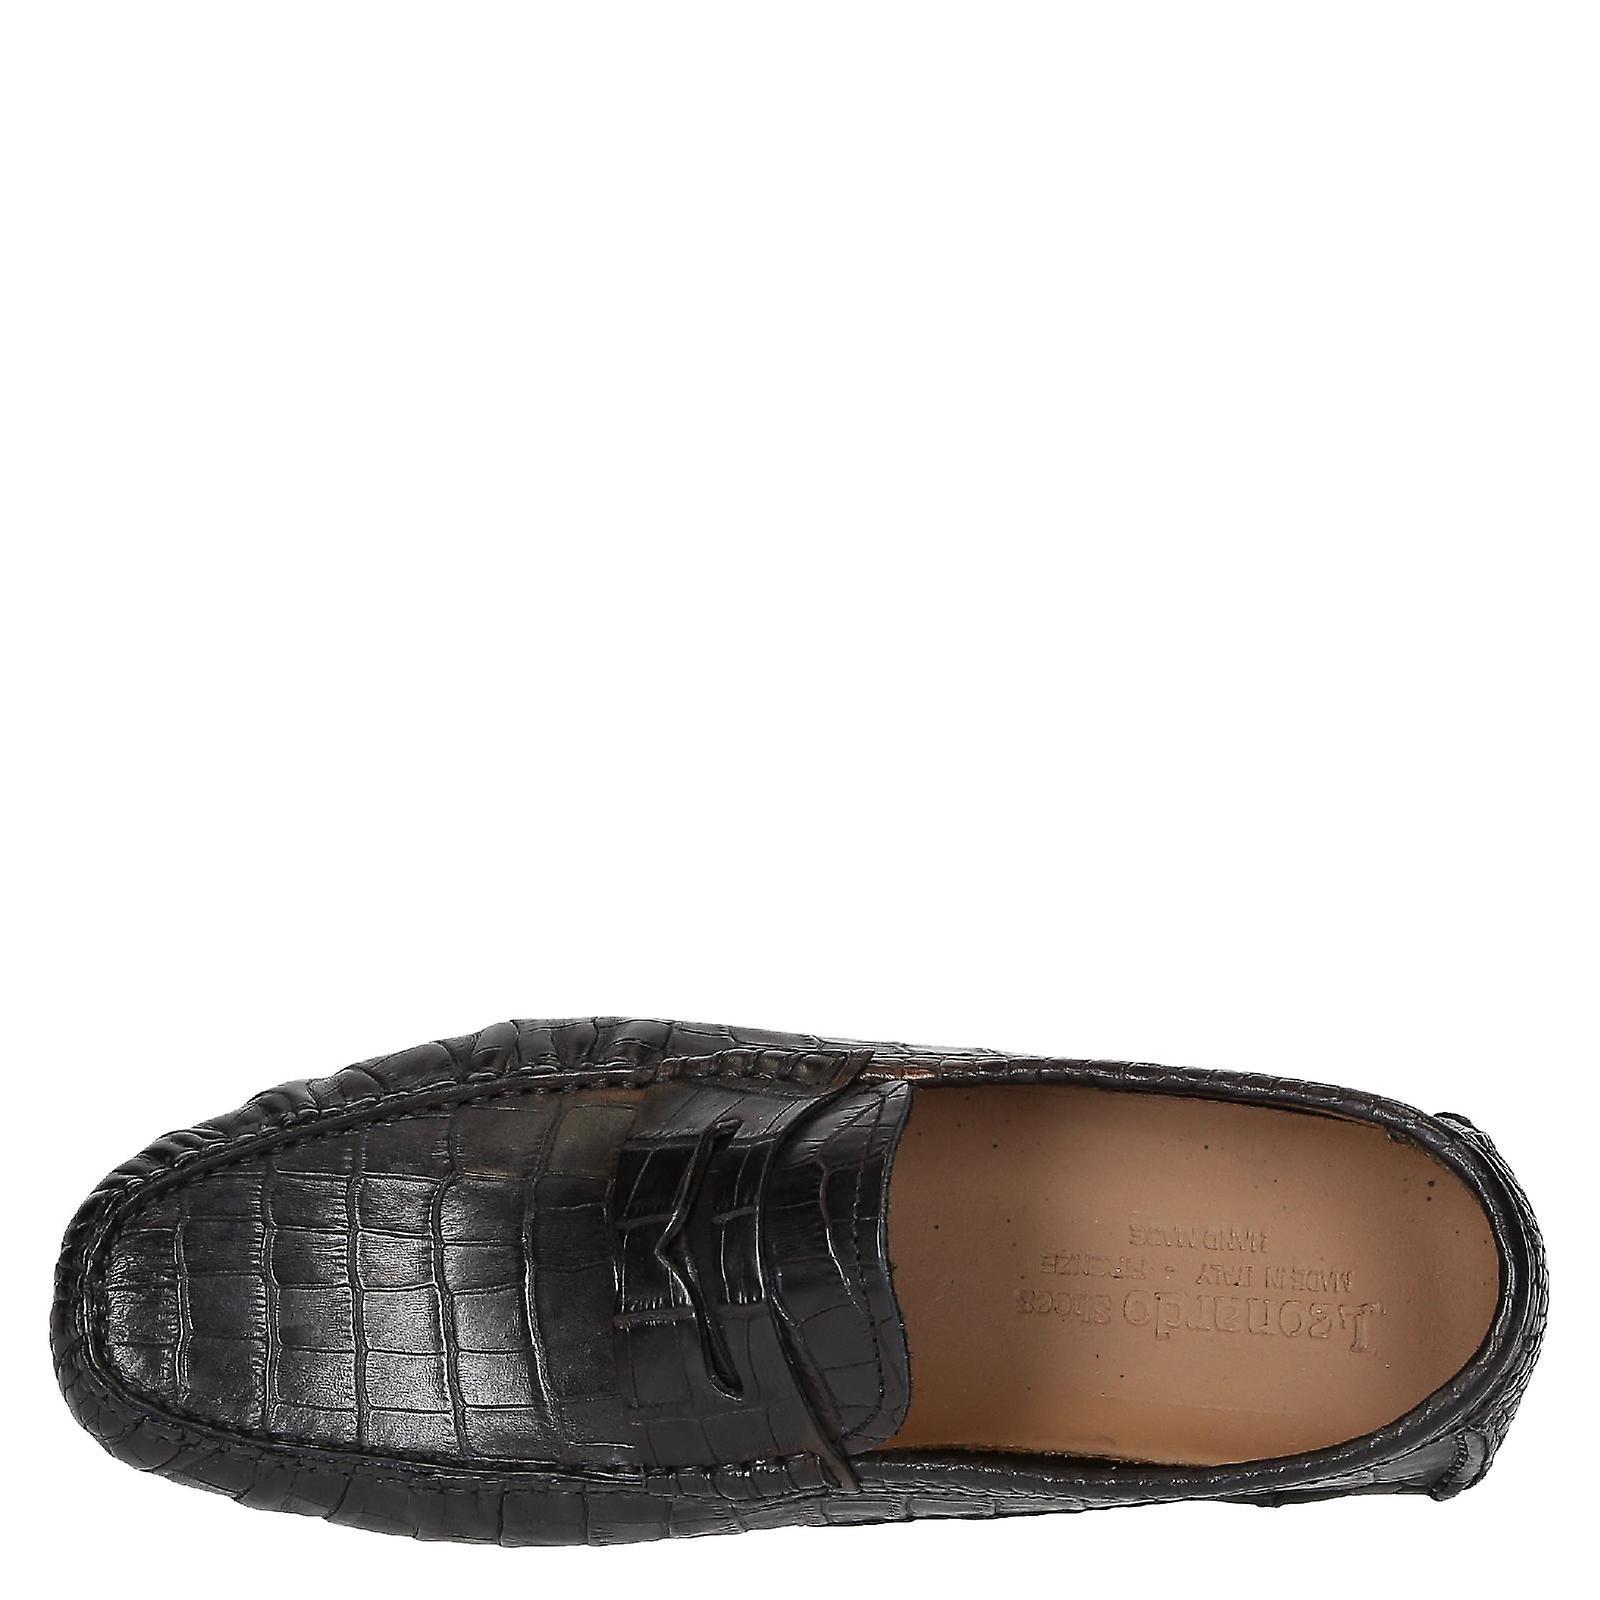 Mocassins homme en cuir de texture croco noir